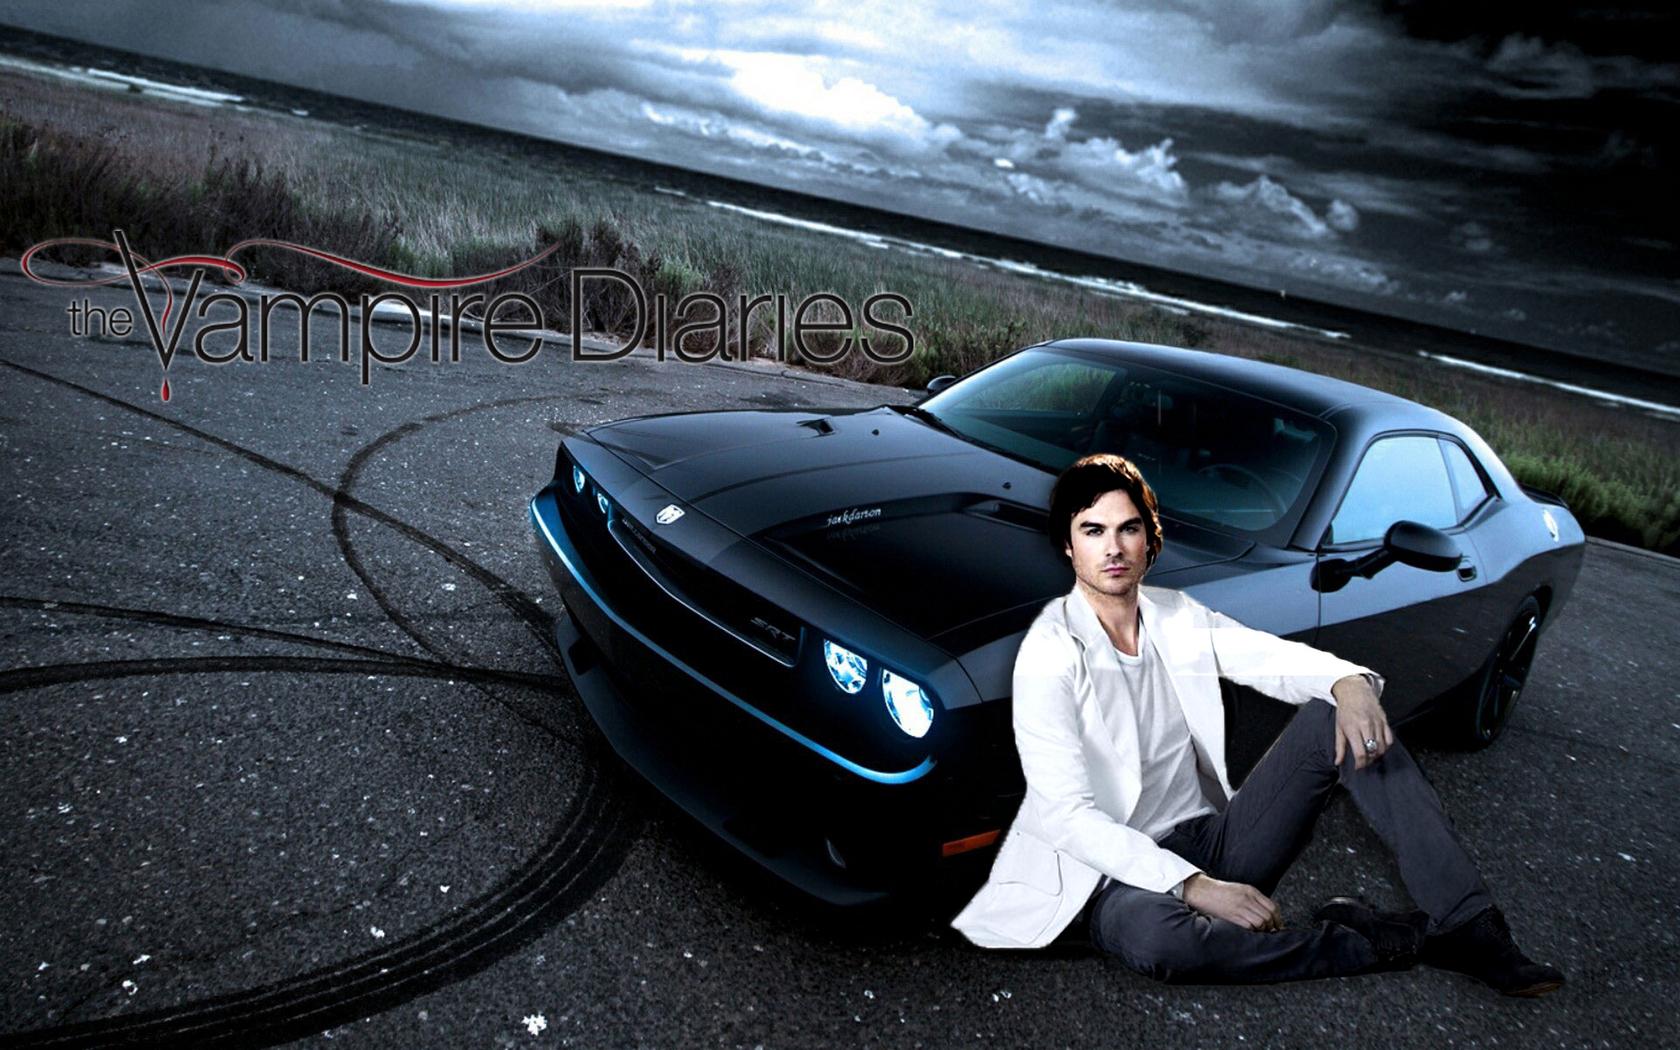 Damon   The Vampire Diaries Wallpaper 30734371 1680x1050